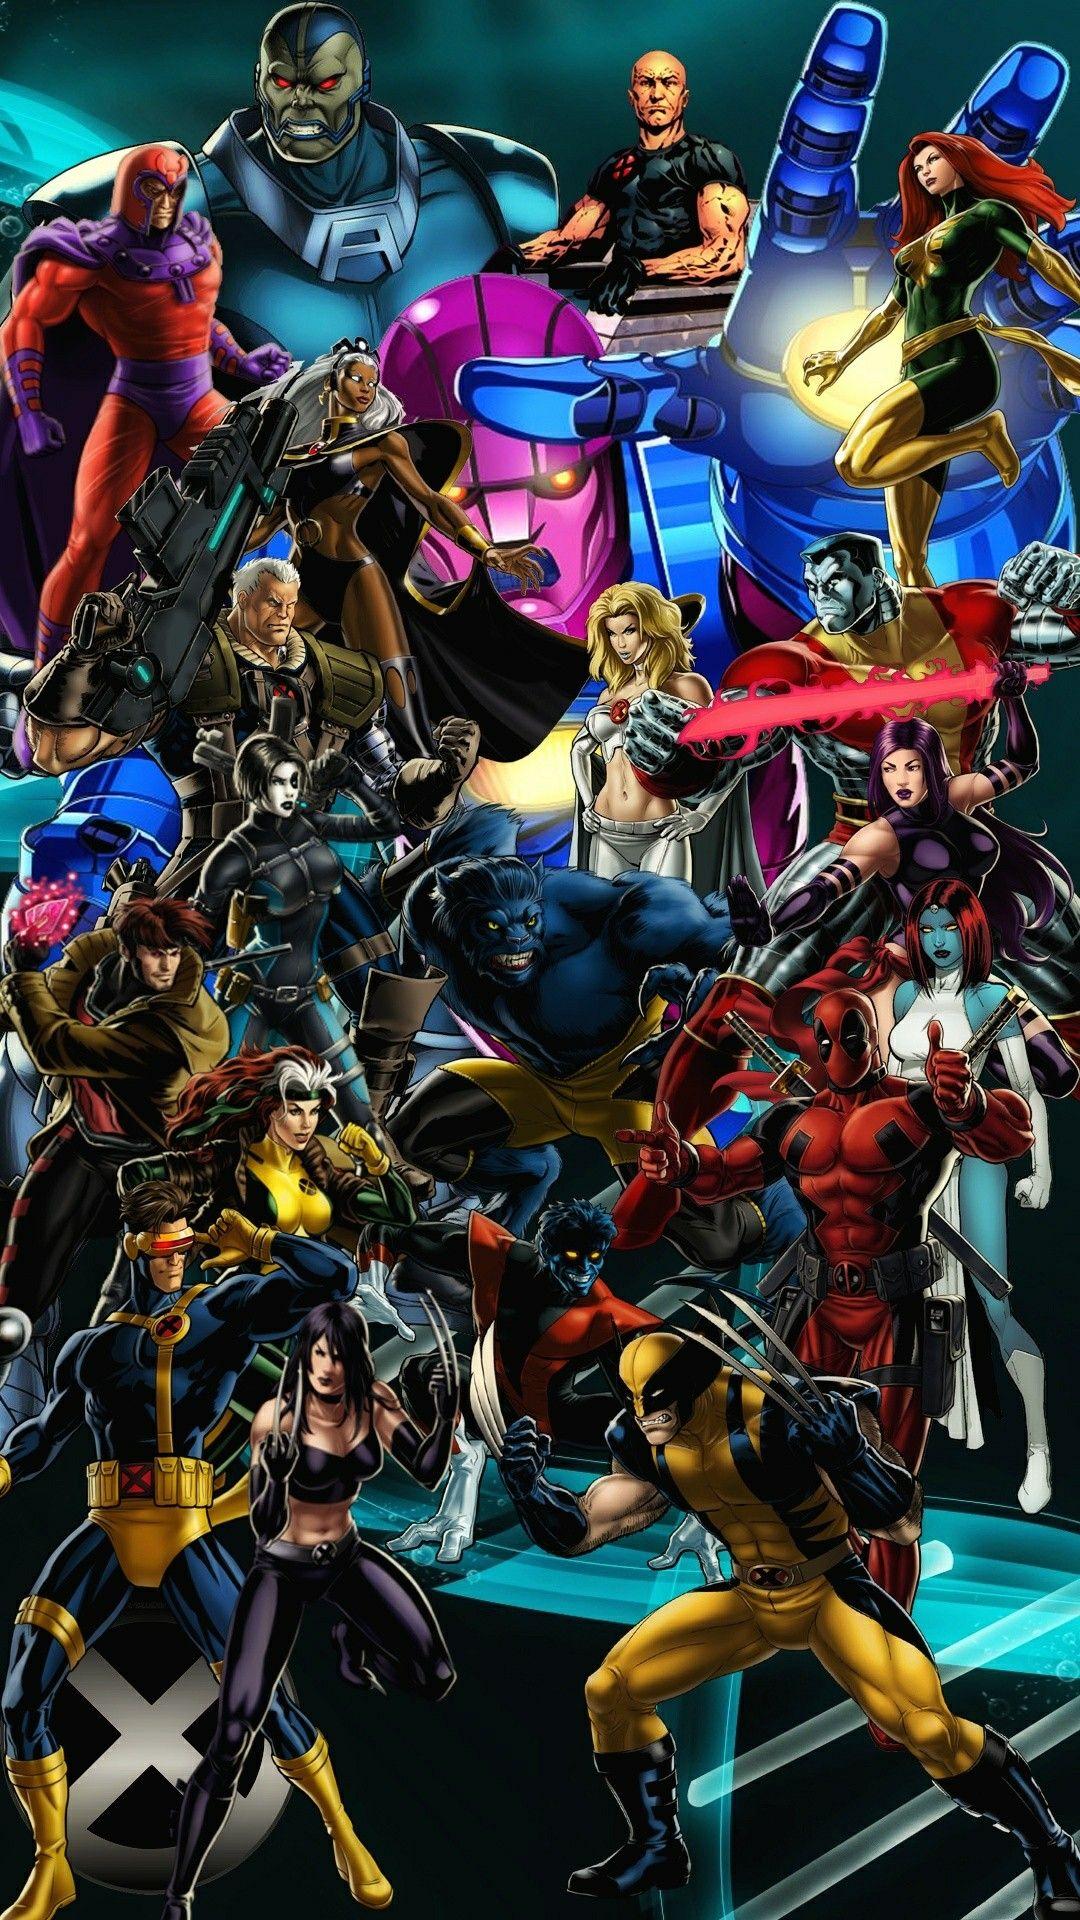 X Men Wallpaper For Smartphone | Wallpapers Smartphone | Marvel, Marvel comics y Comics